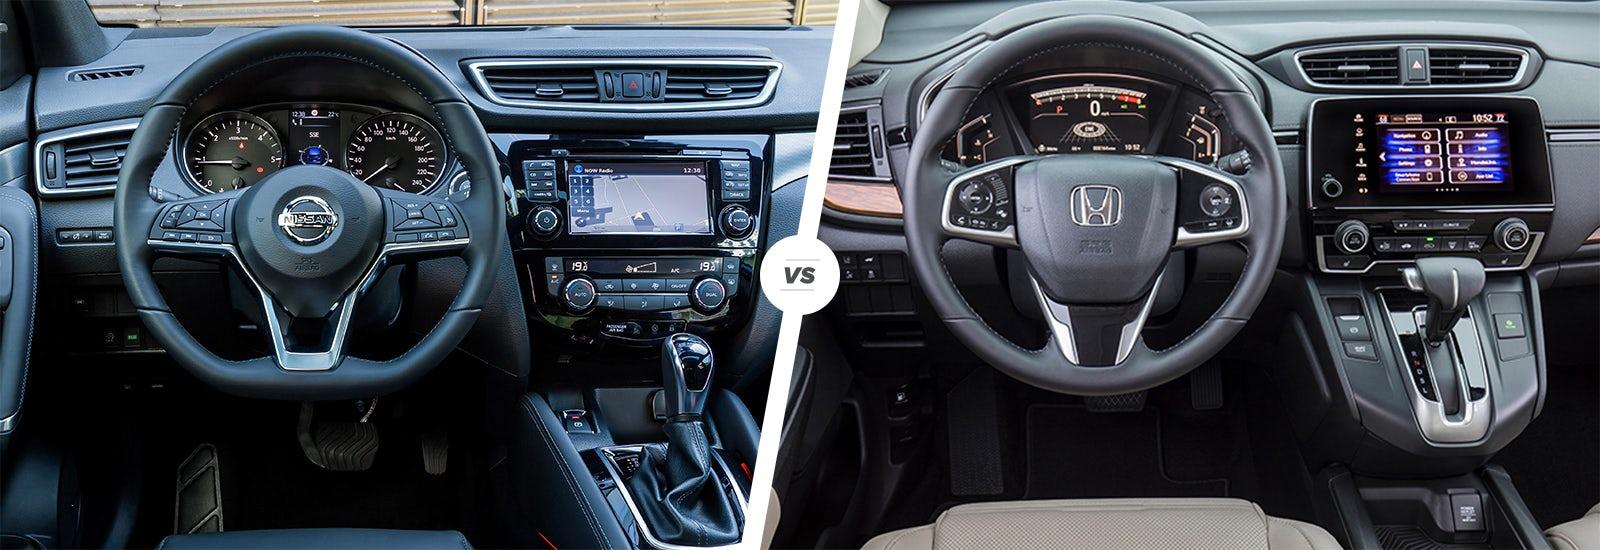 Mazda Cx 5 2017 Interior >> Nissan Qashqai vs Honda CR-V: which is best? | carwow